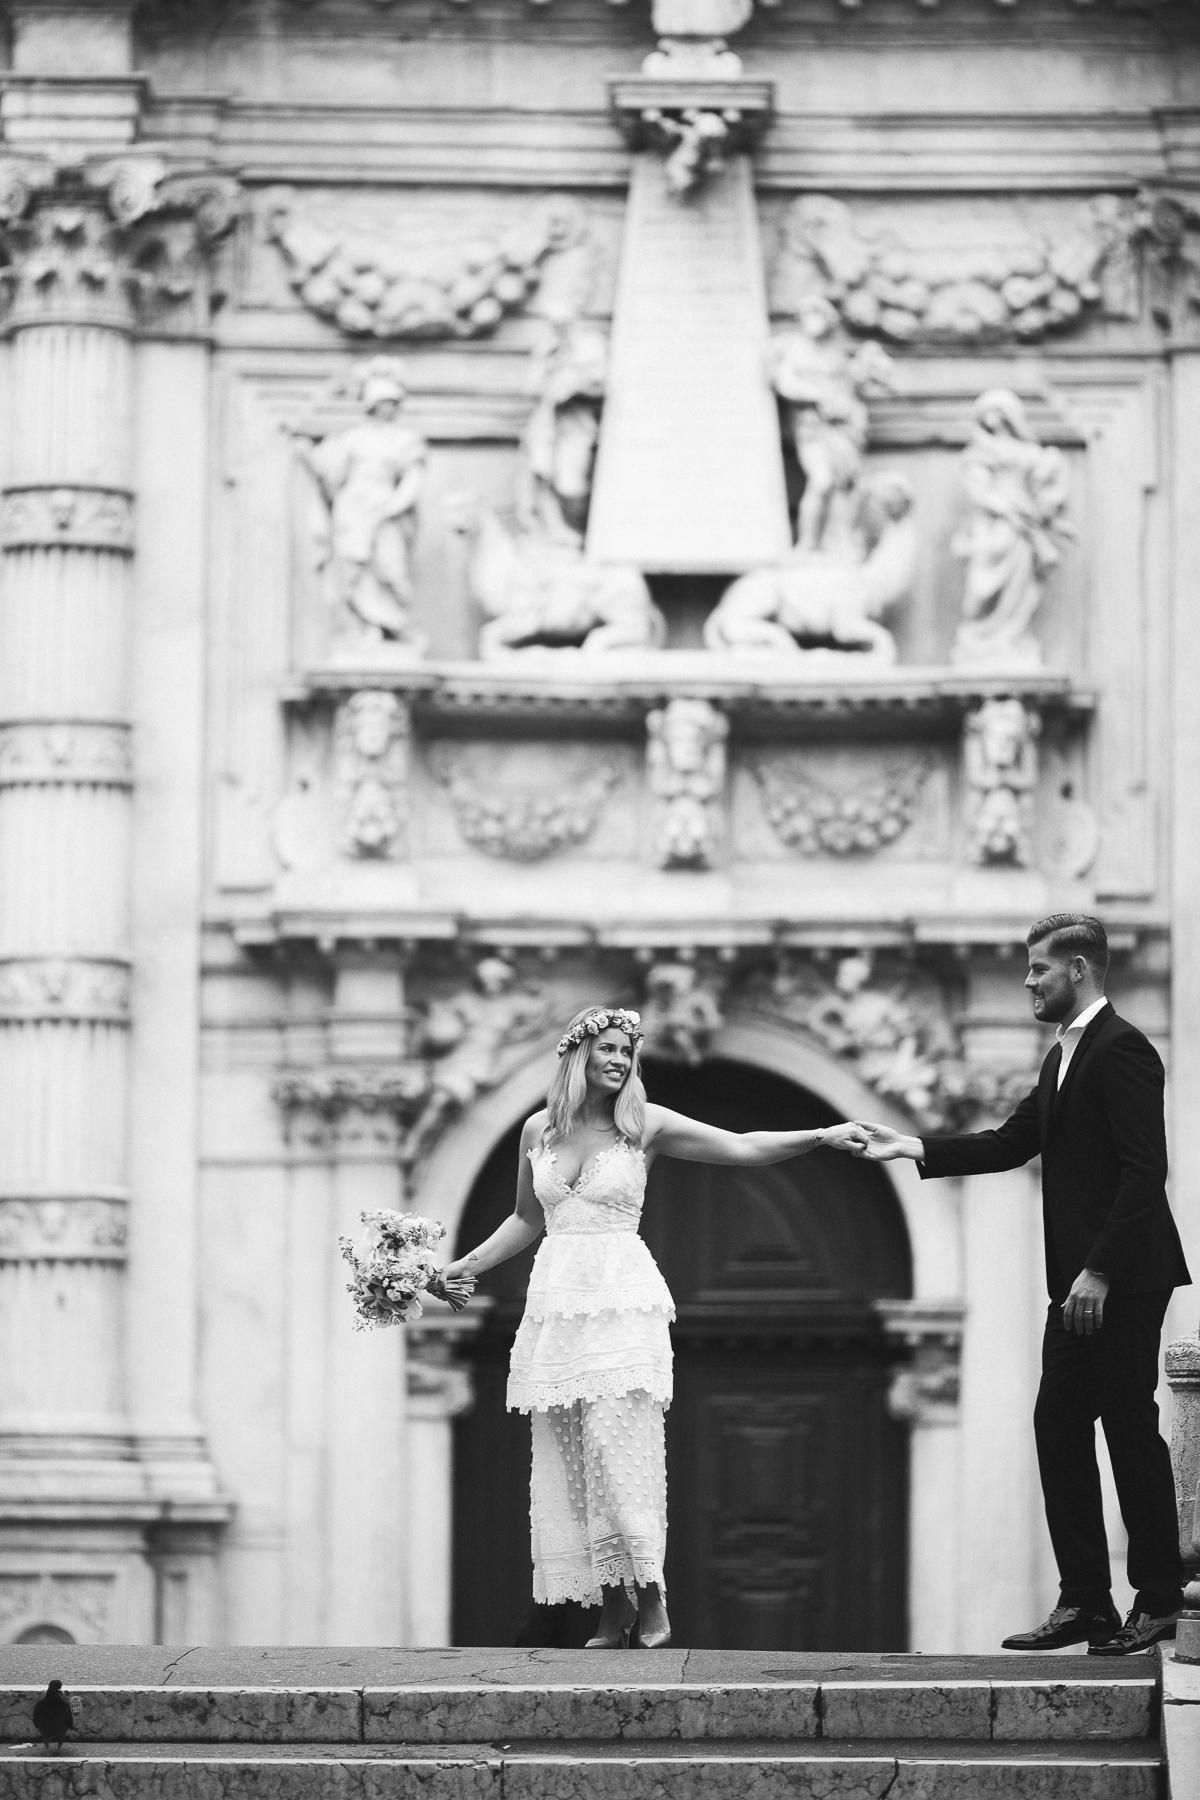 Hochzeitsfotograf Le Hai Linh Boho Chic After Wedding Shooting Venedig Timo Horn 1.FC Koeln 035.jpg